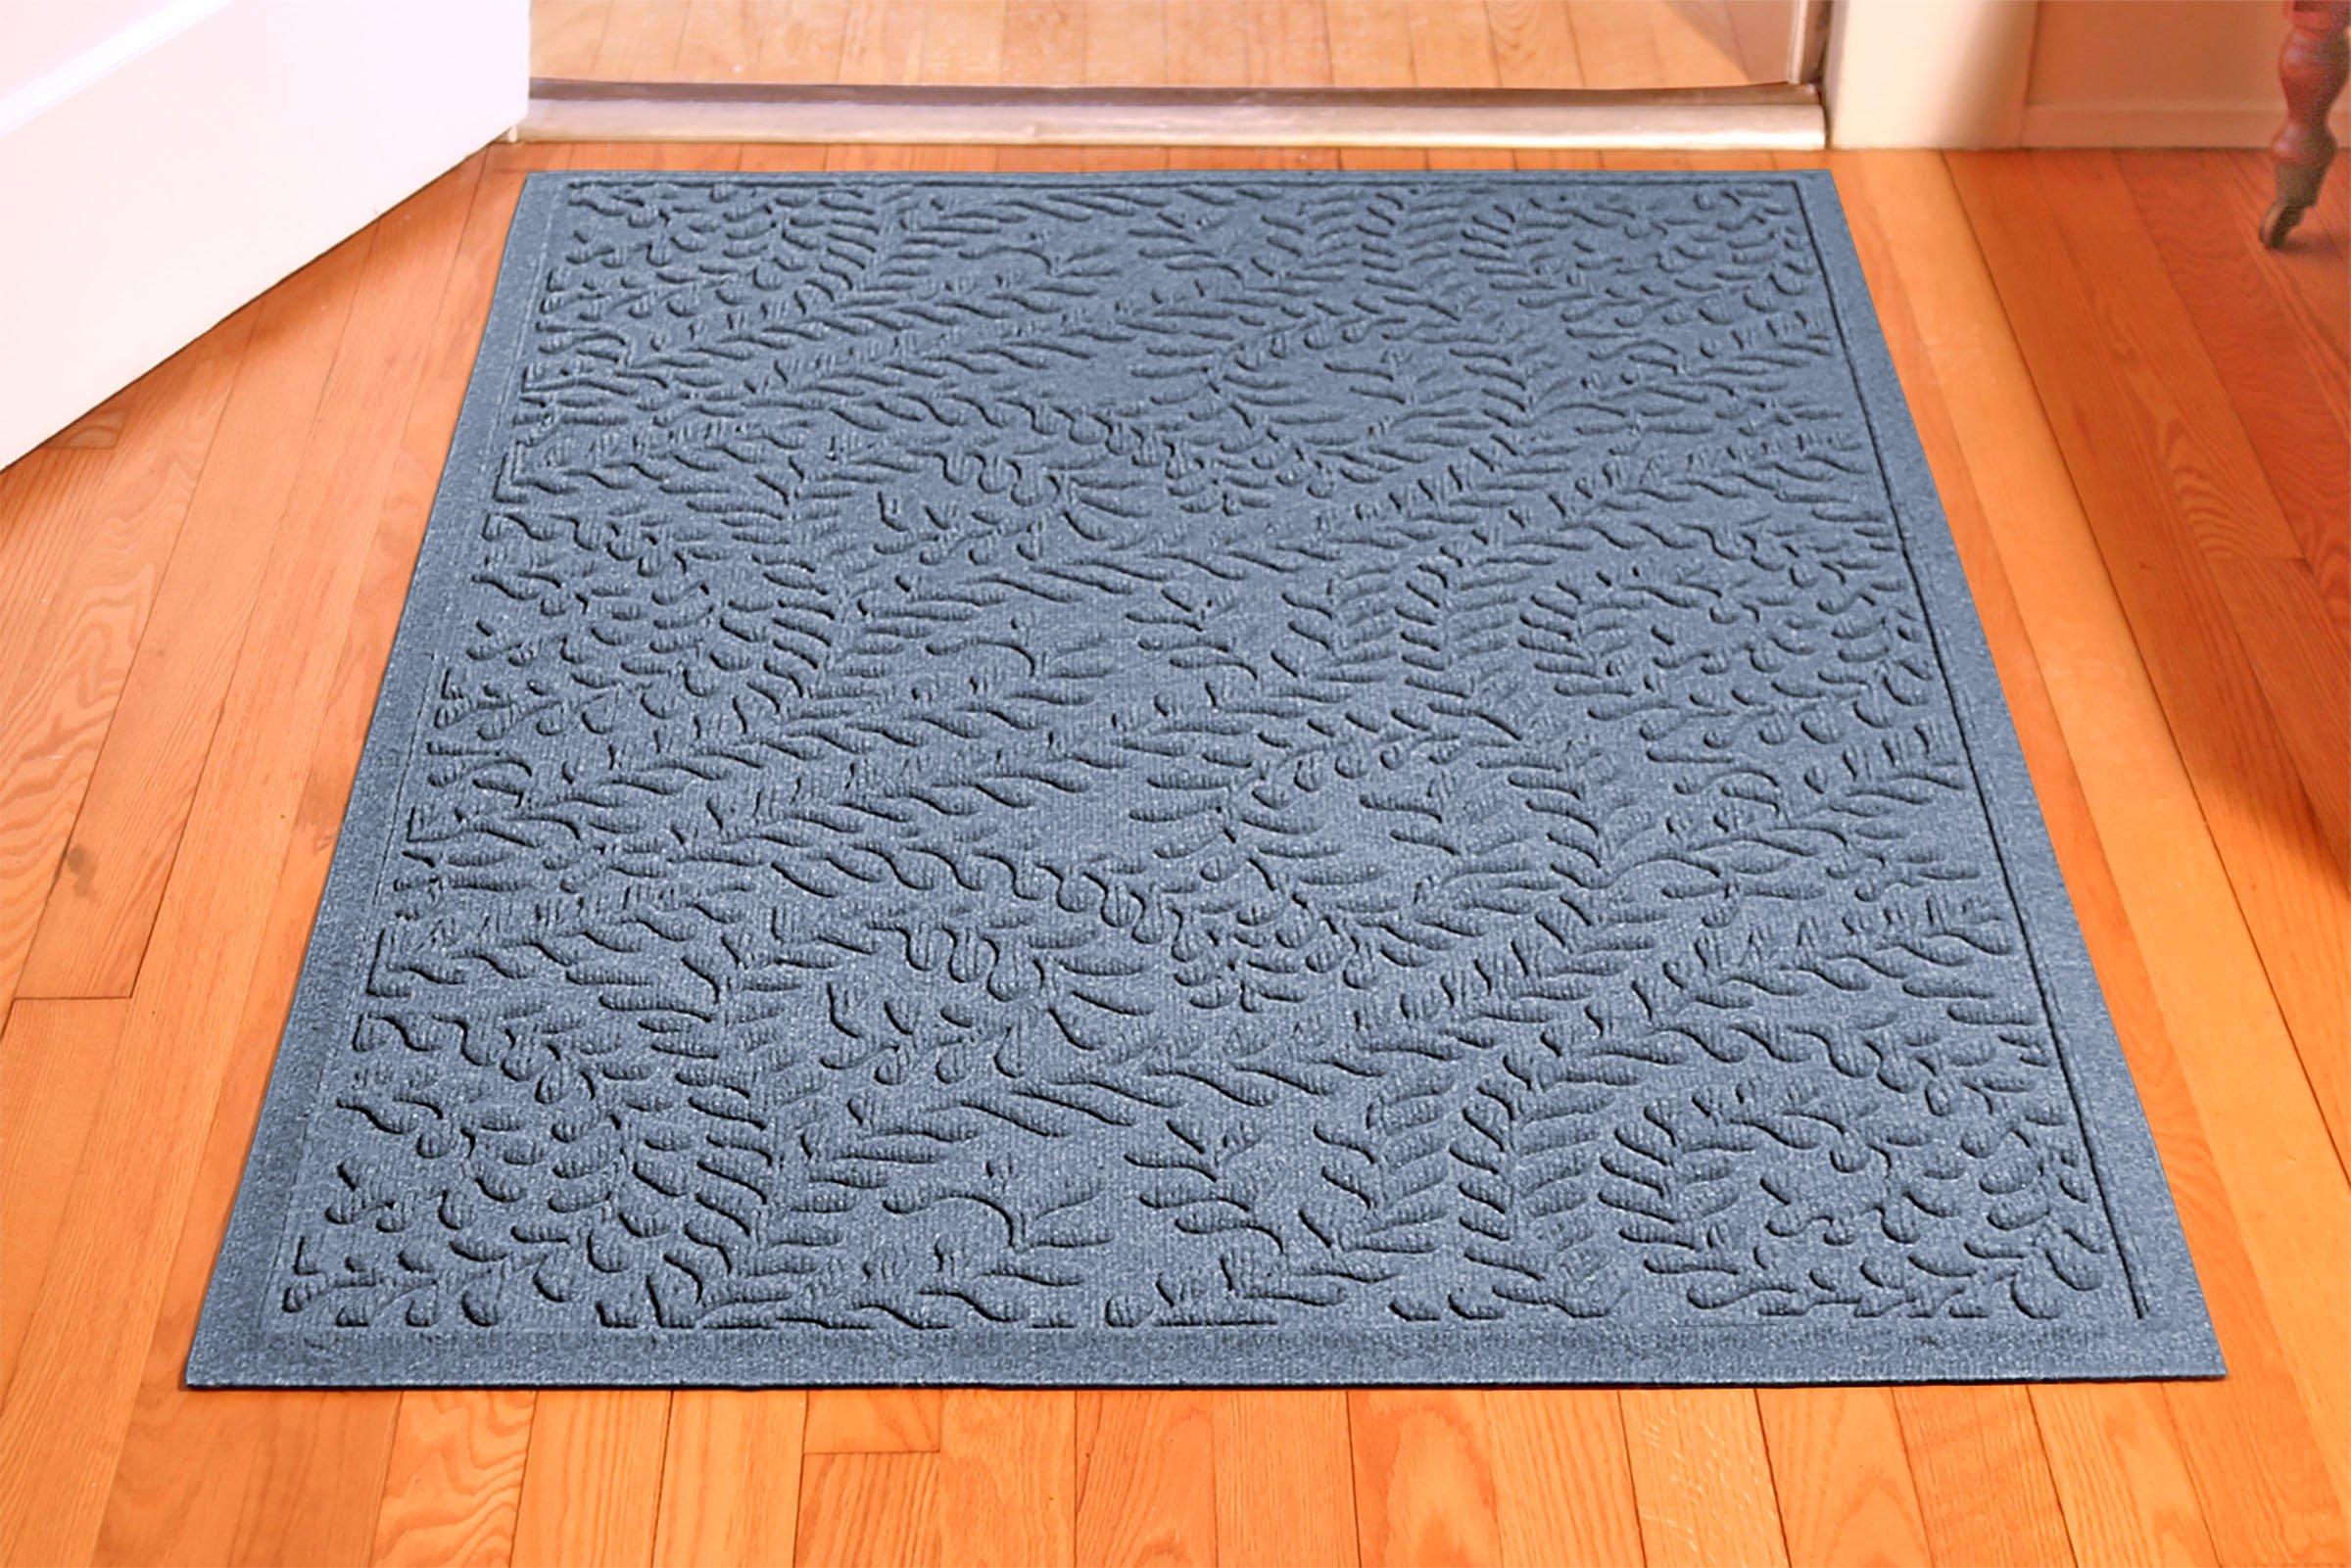 Bungalow Flooring Waterhog Indoor/Outdoor Doormat, 3' x 5', Skid Resistant, Easy to Clean, Catches Water and Debris, Boxwood Collection, Bluestone by Bungalow Flooring (Image #3)